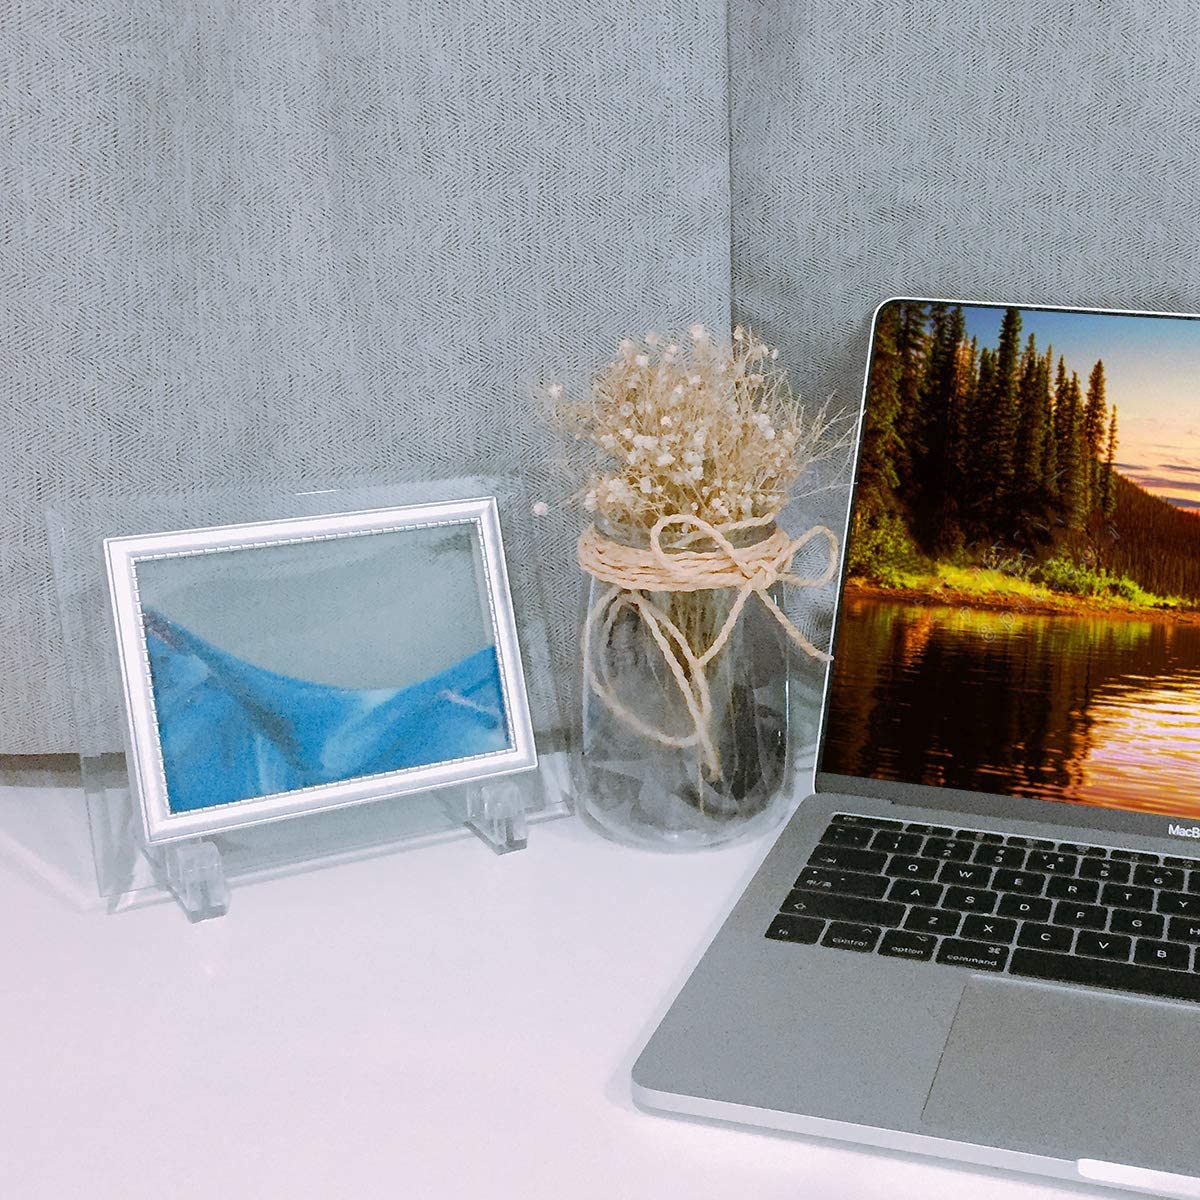 Medium Size 7x9 Sand in Motion blue Moving Desktop Art Coitak Sandscape Dynamic Sand Picture